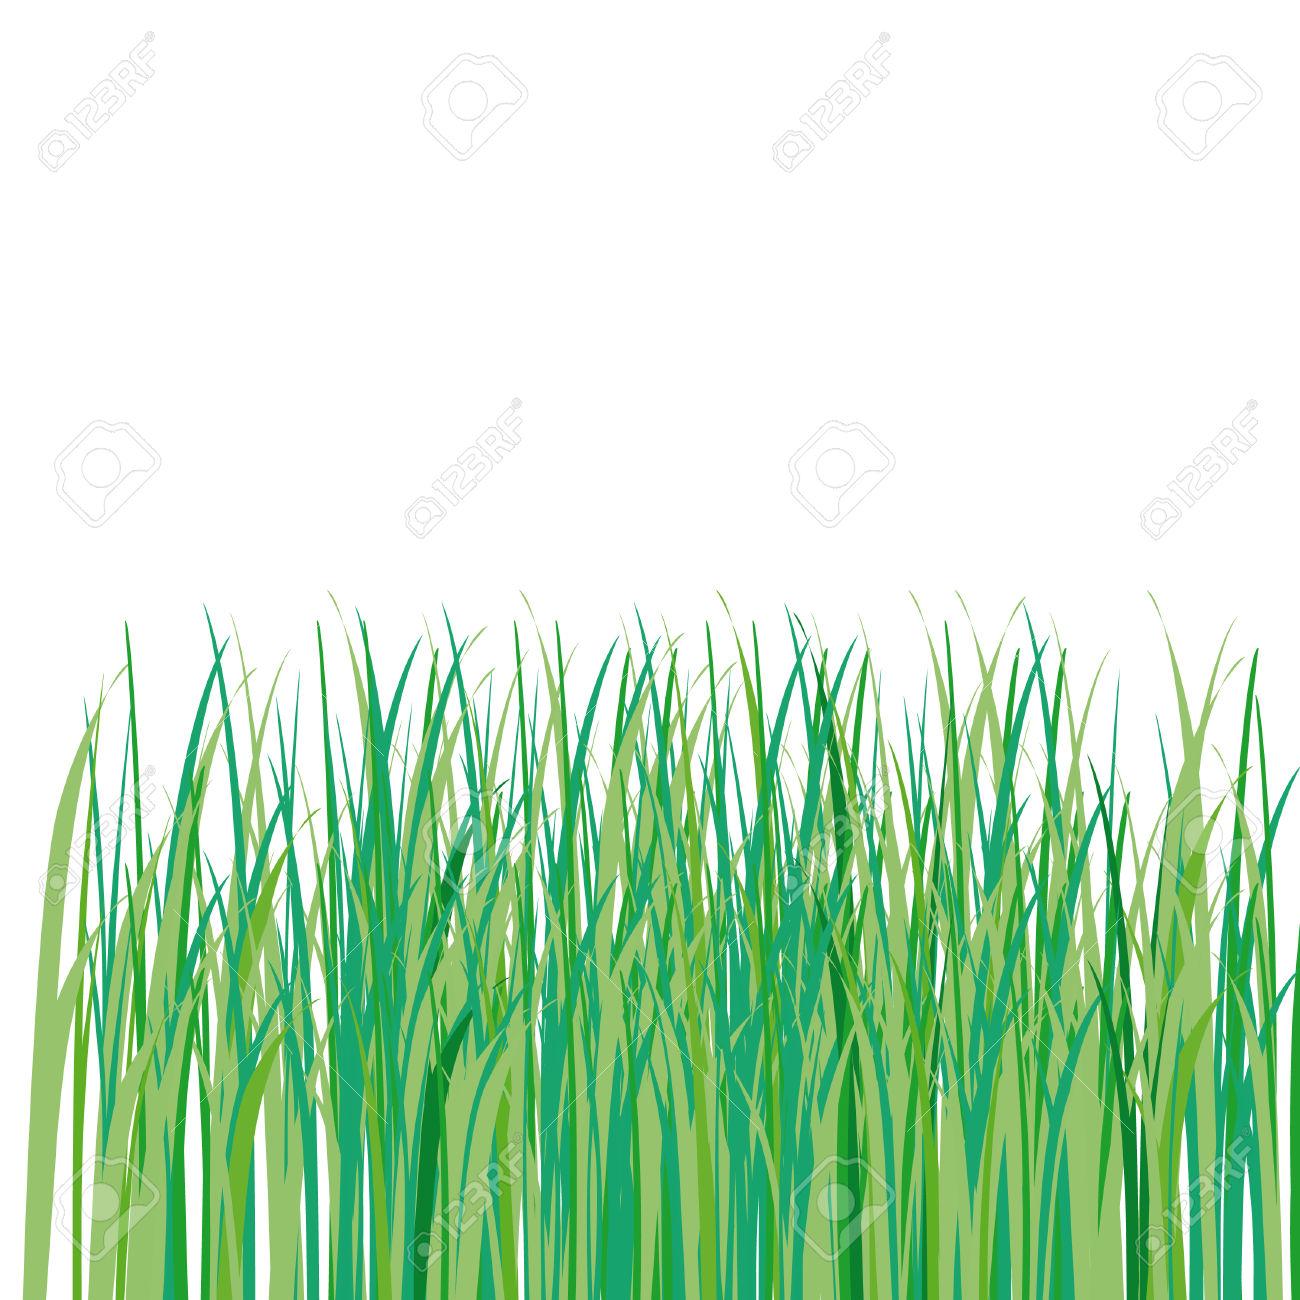 1300x1300 Drawn Grass Illustration 3339157